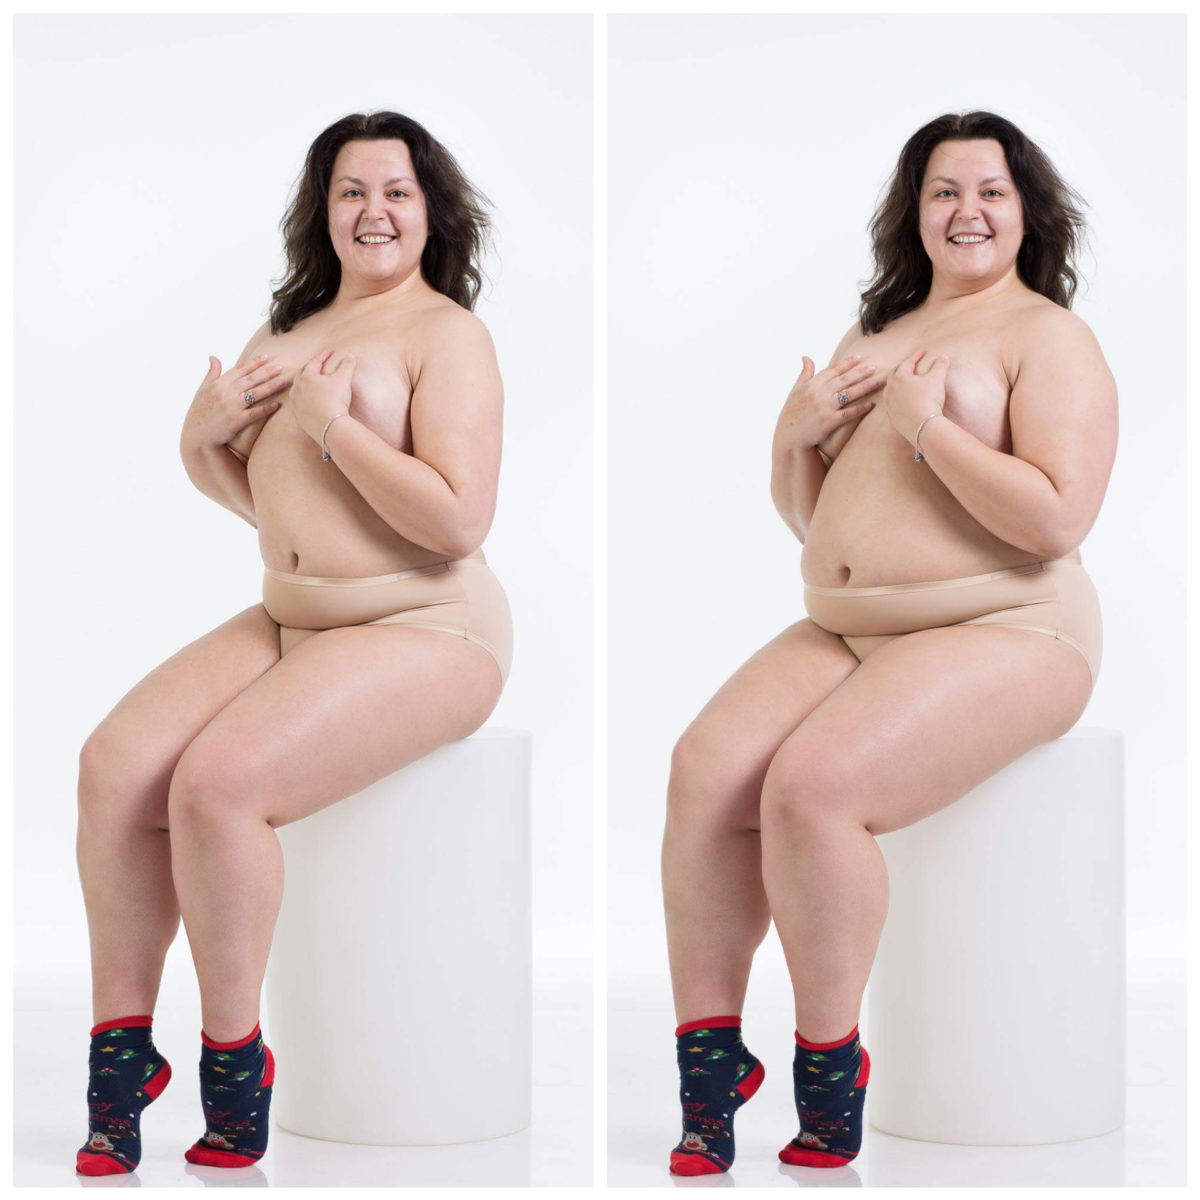 Plus size body positive